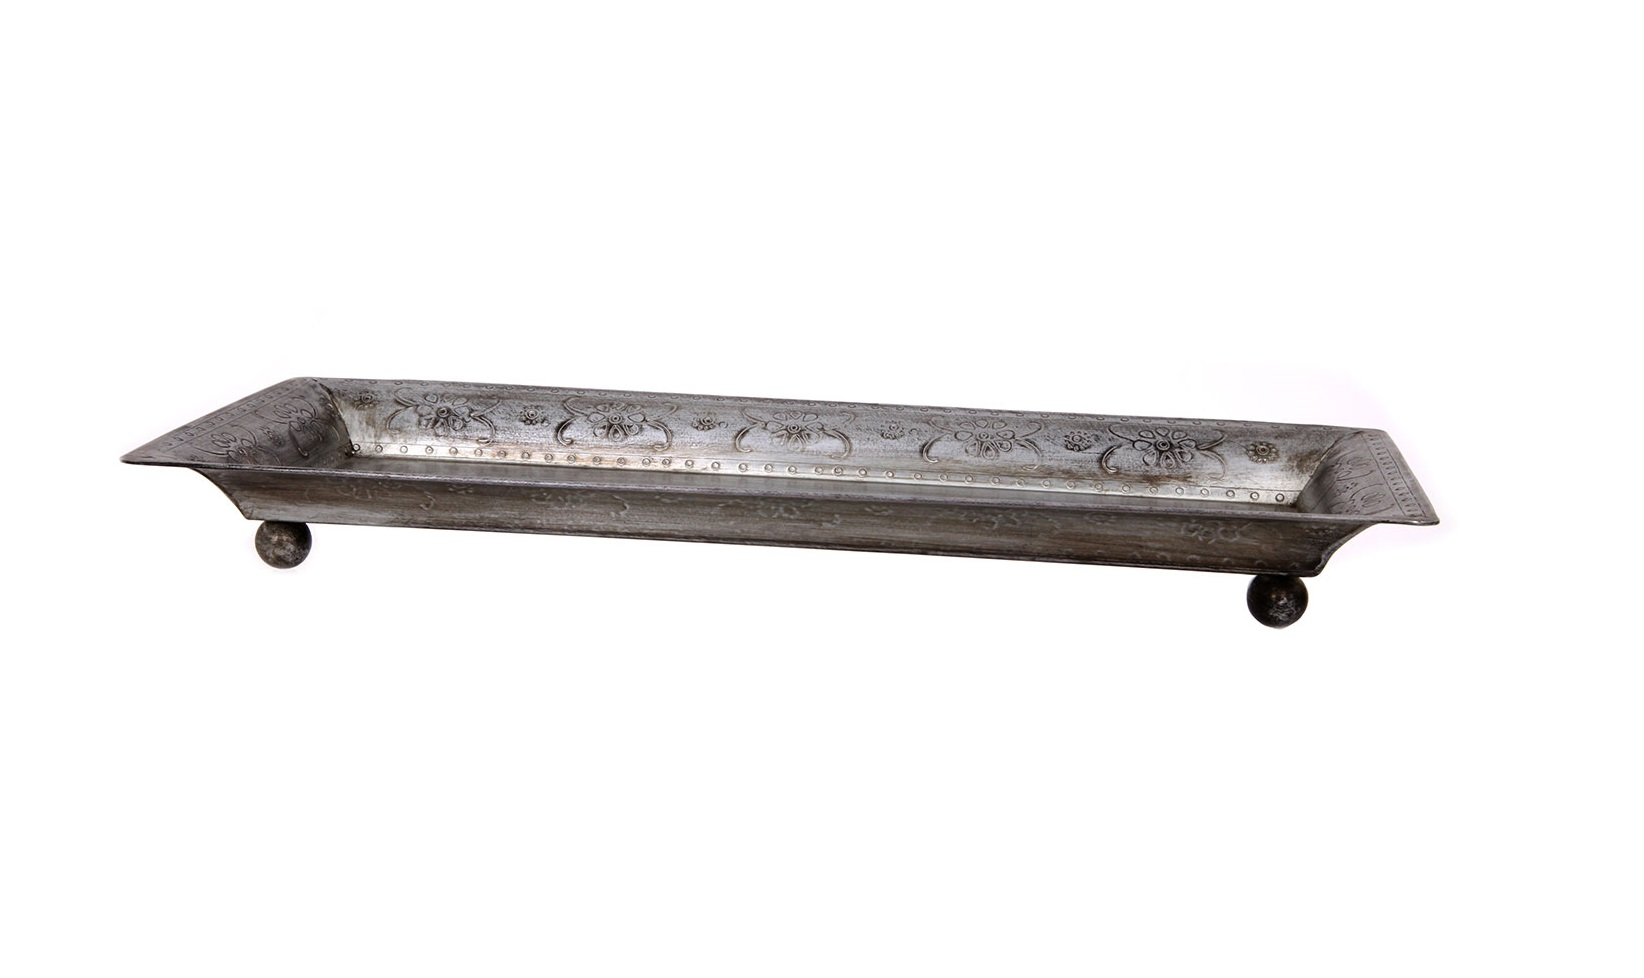 ПодносДекоративные подносы<br><br><br>Material: Металл<br>Length см: None<br>Width см: 31<br>Depth см: 13<br>Height см: 4